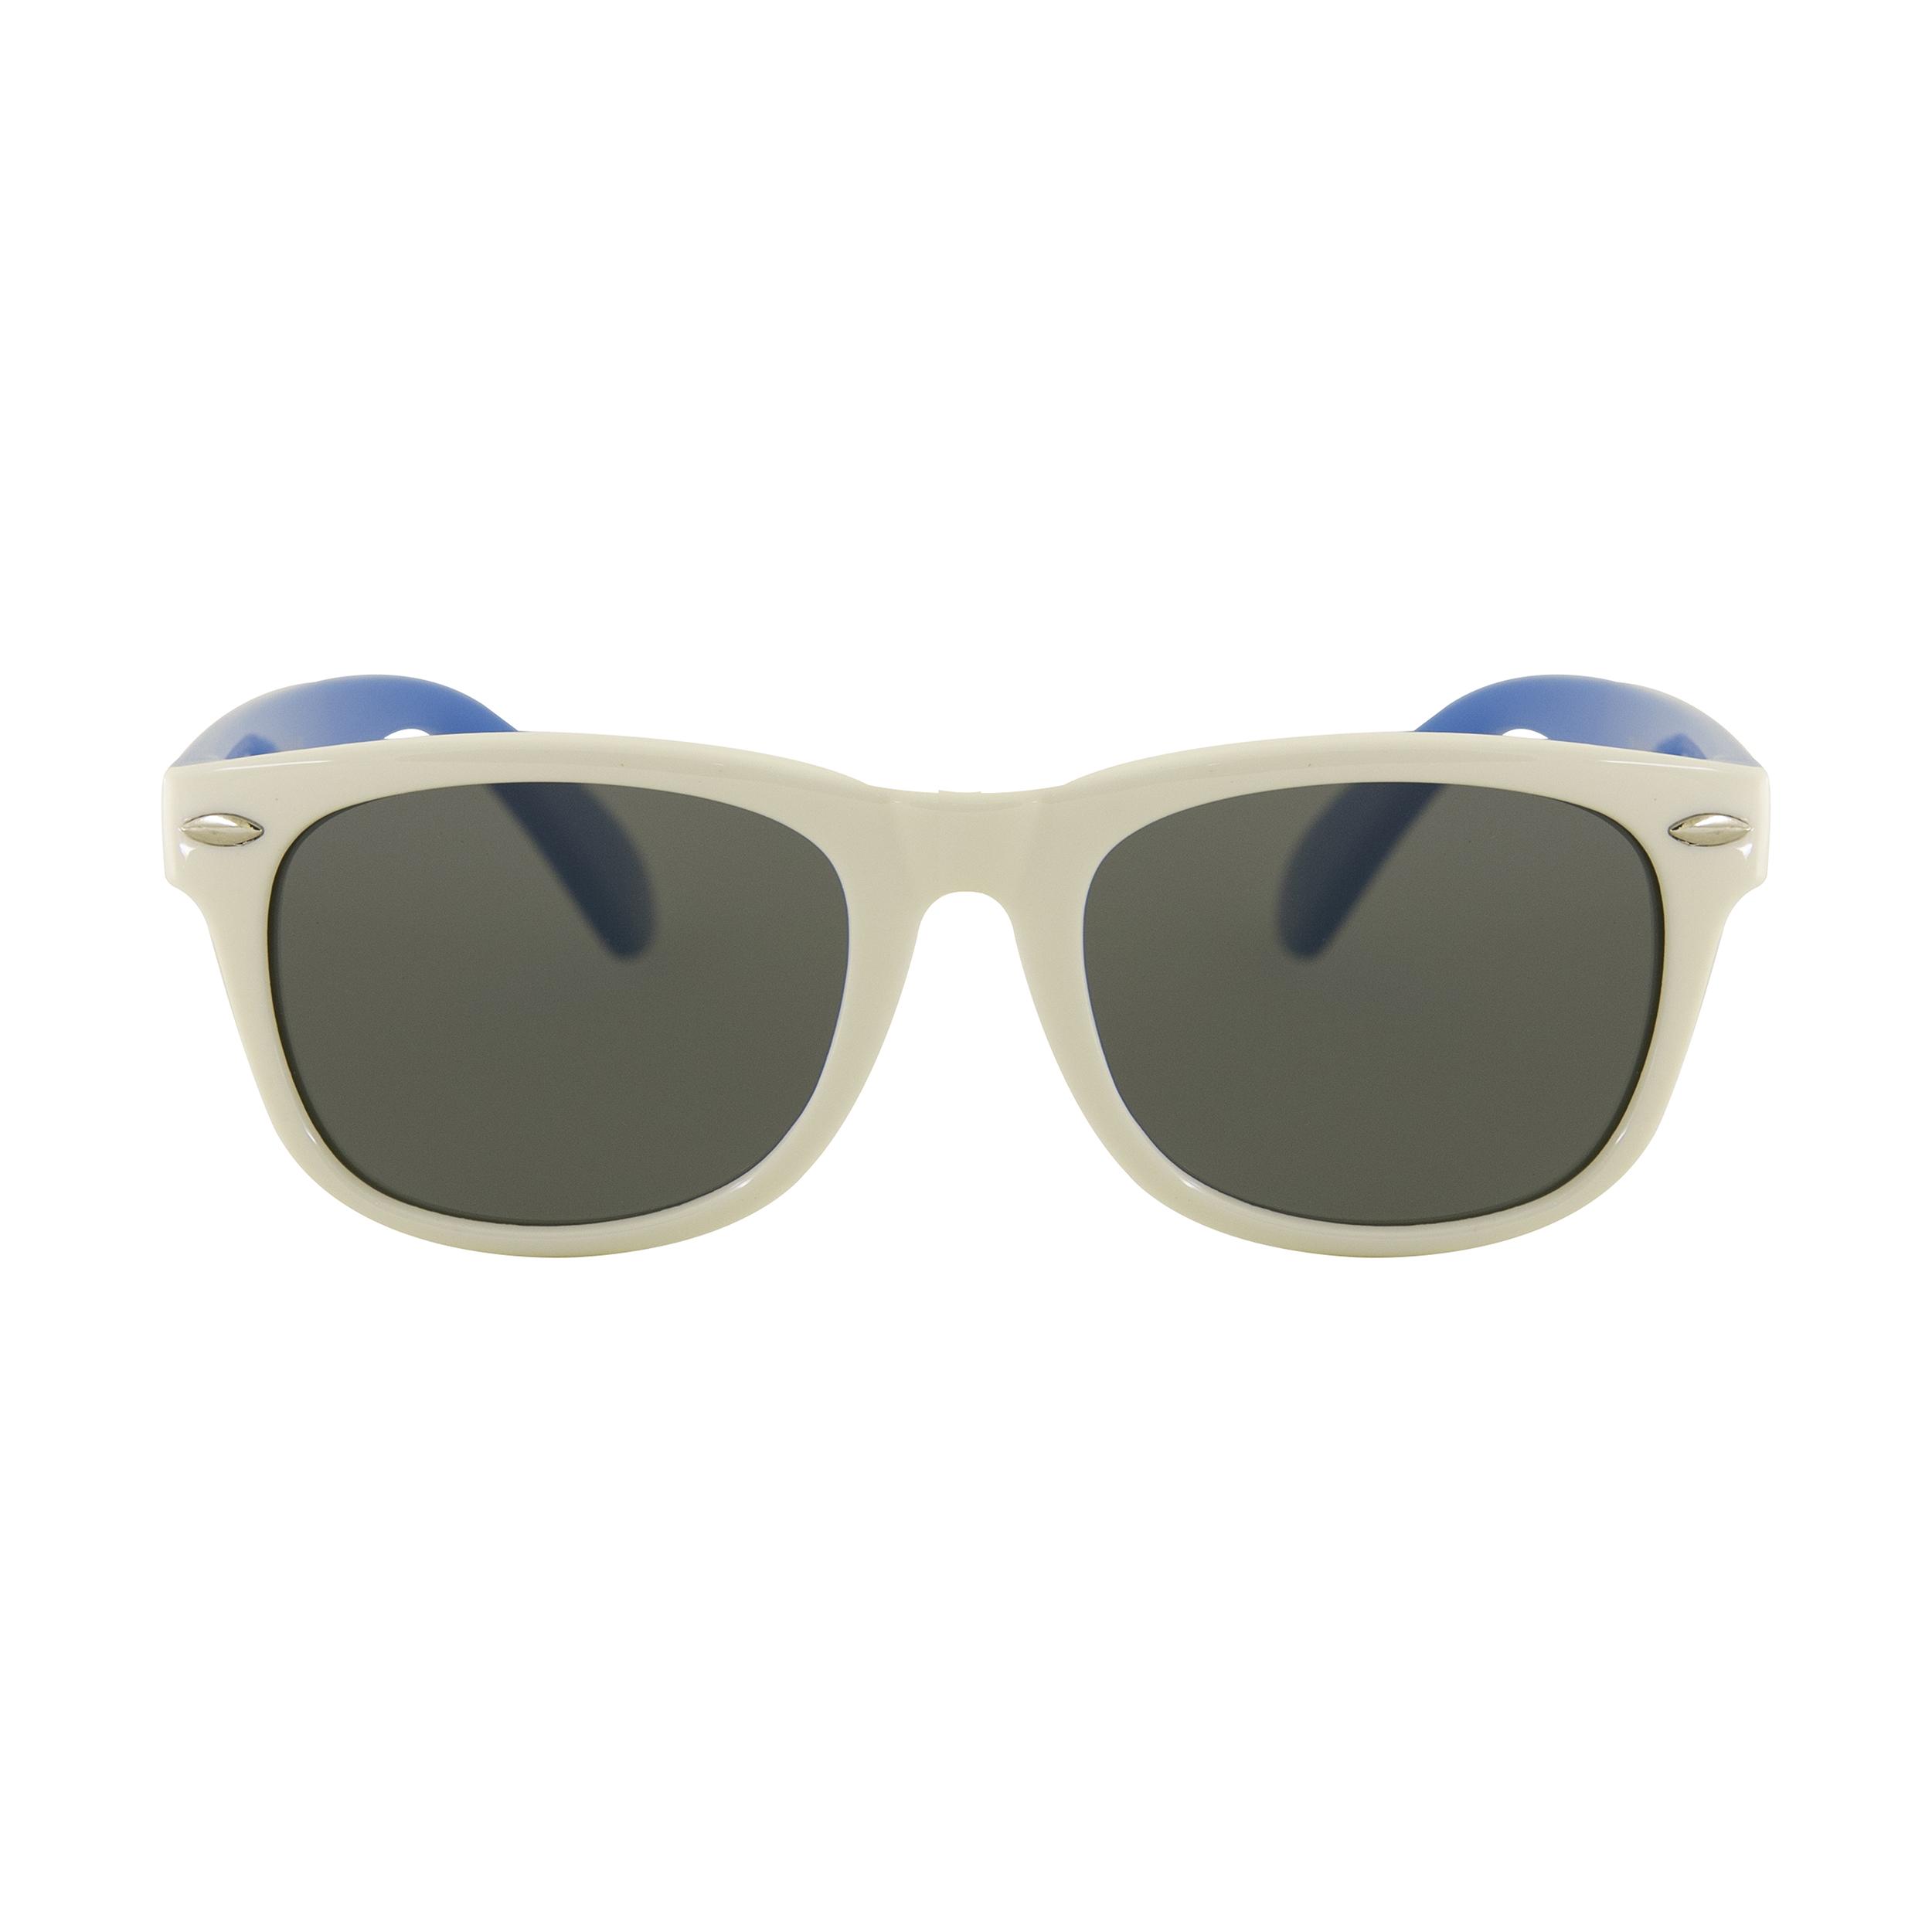 عینک آفتابی پسرانه کد S802 -  - 2